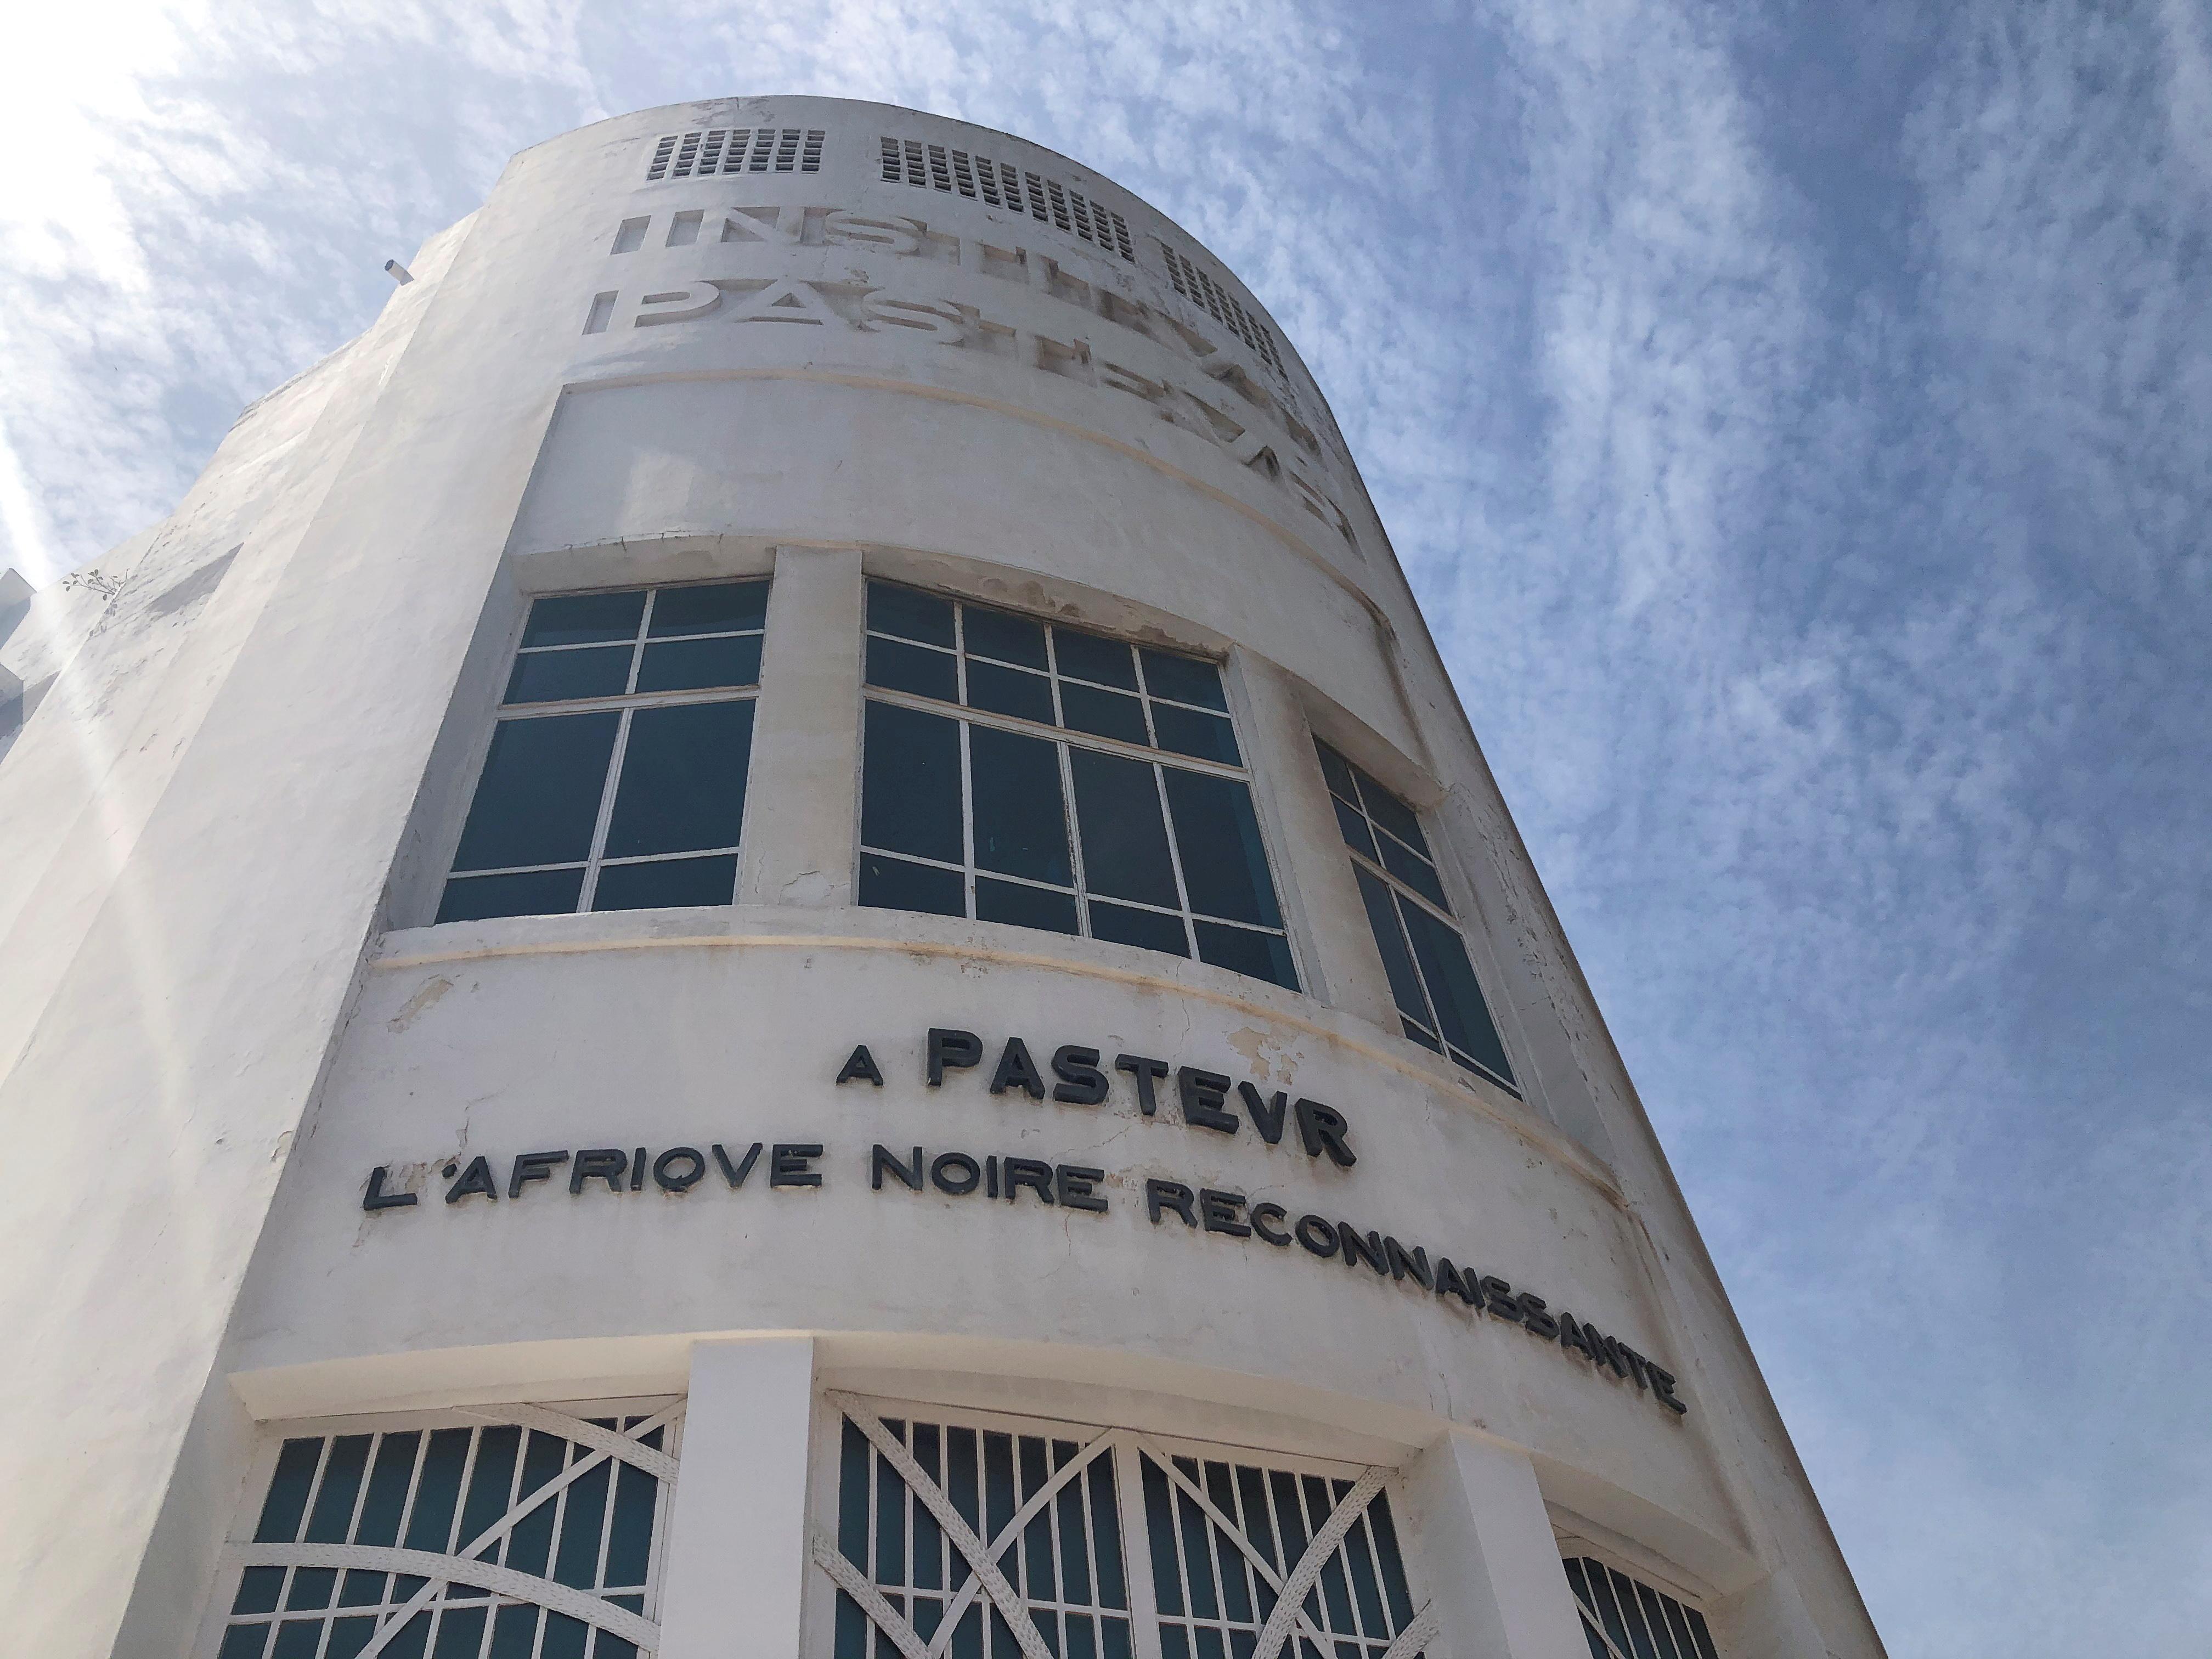 A view of the Pasteur Institute building in Dakar, Senegal March 2, 2020. REUTERS/Christophe Van Der Perre